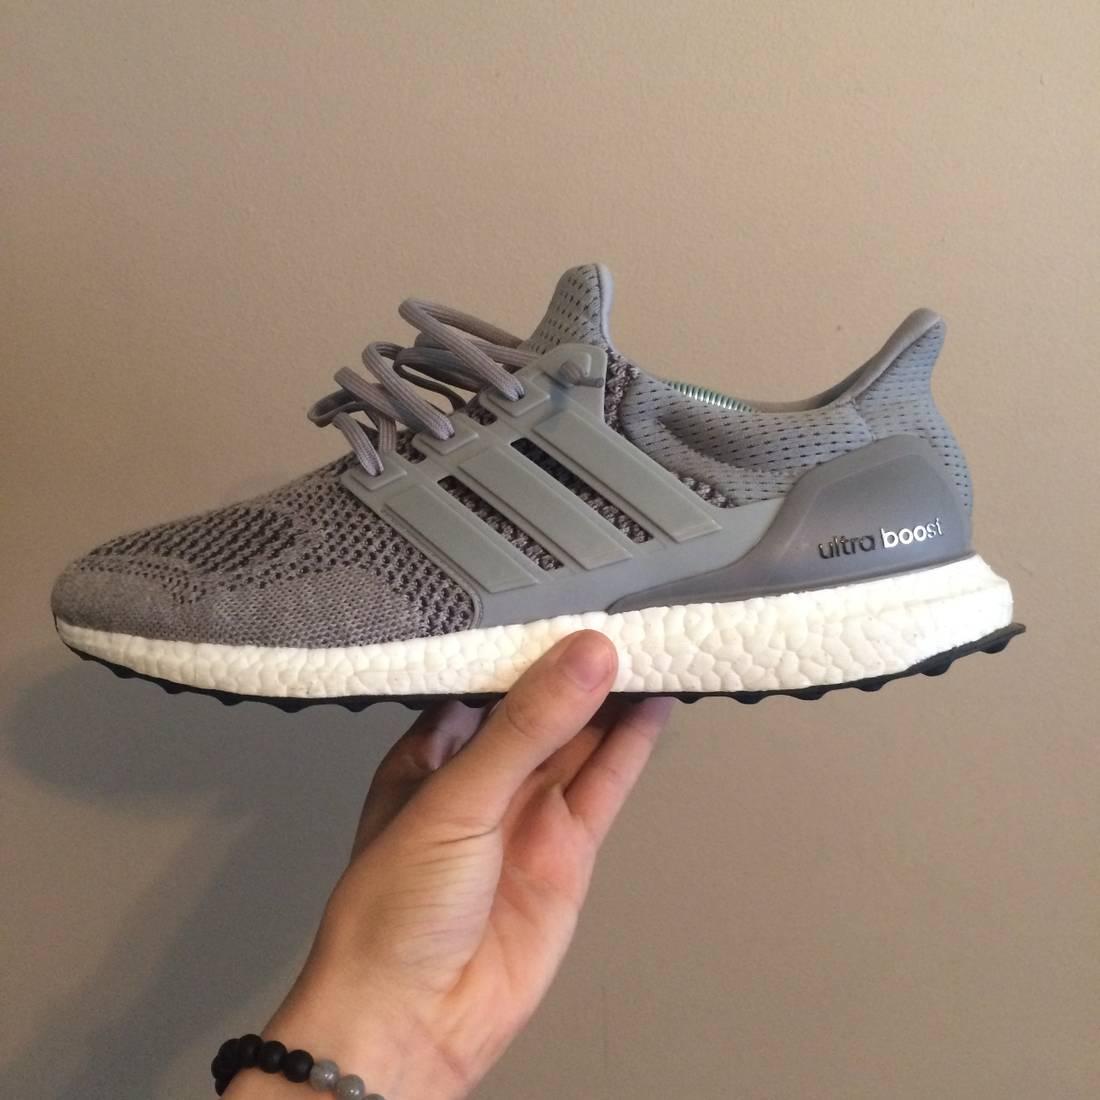 Adidas Ultraboost 1.0 wool grey sz 11